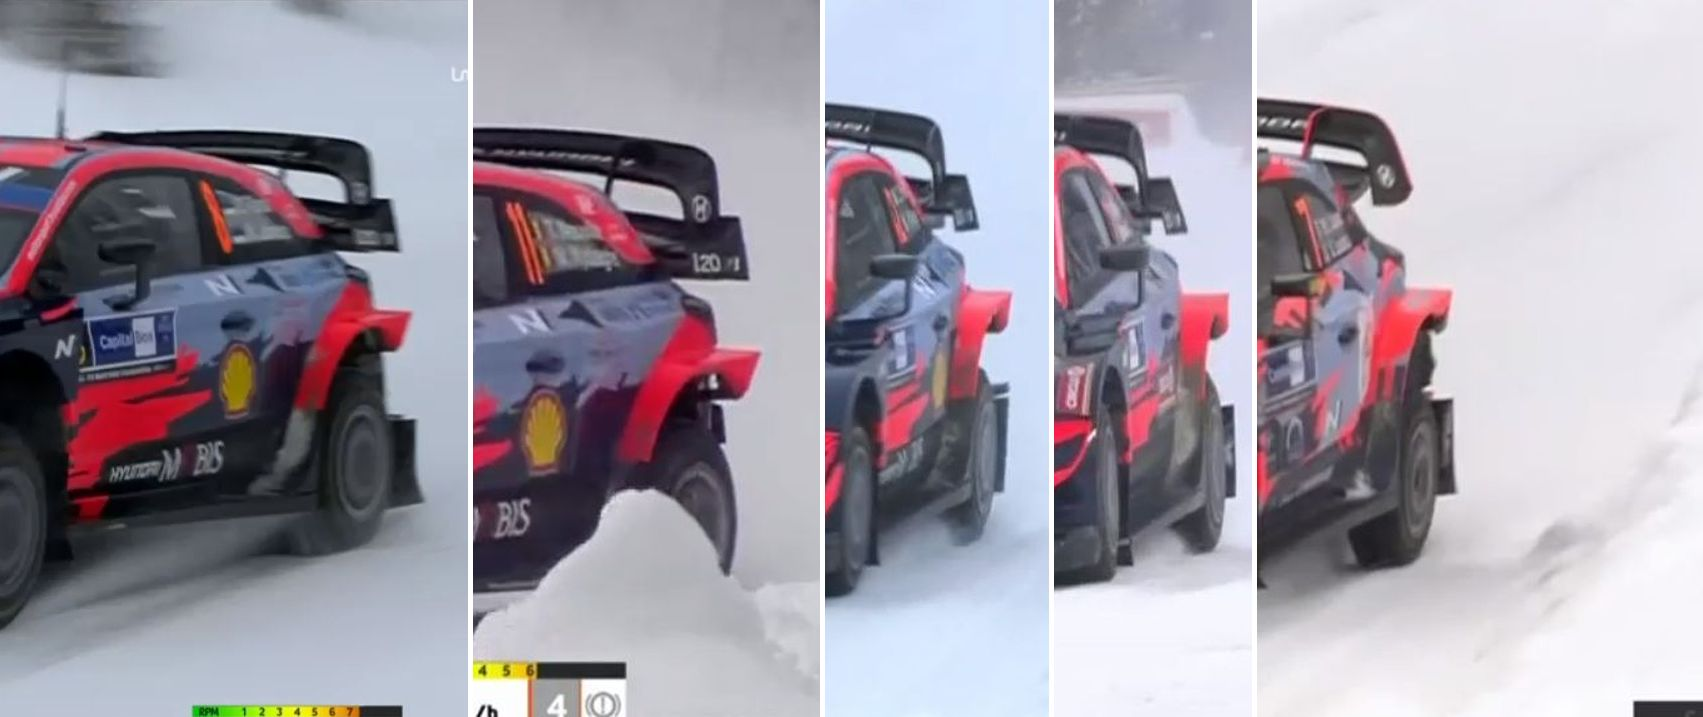 WRC: Arctic Rally Finland - Powered by CapitalBox [26-28 Febrero] - Página 3 Post-157-0-81317800-1614353343